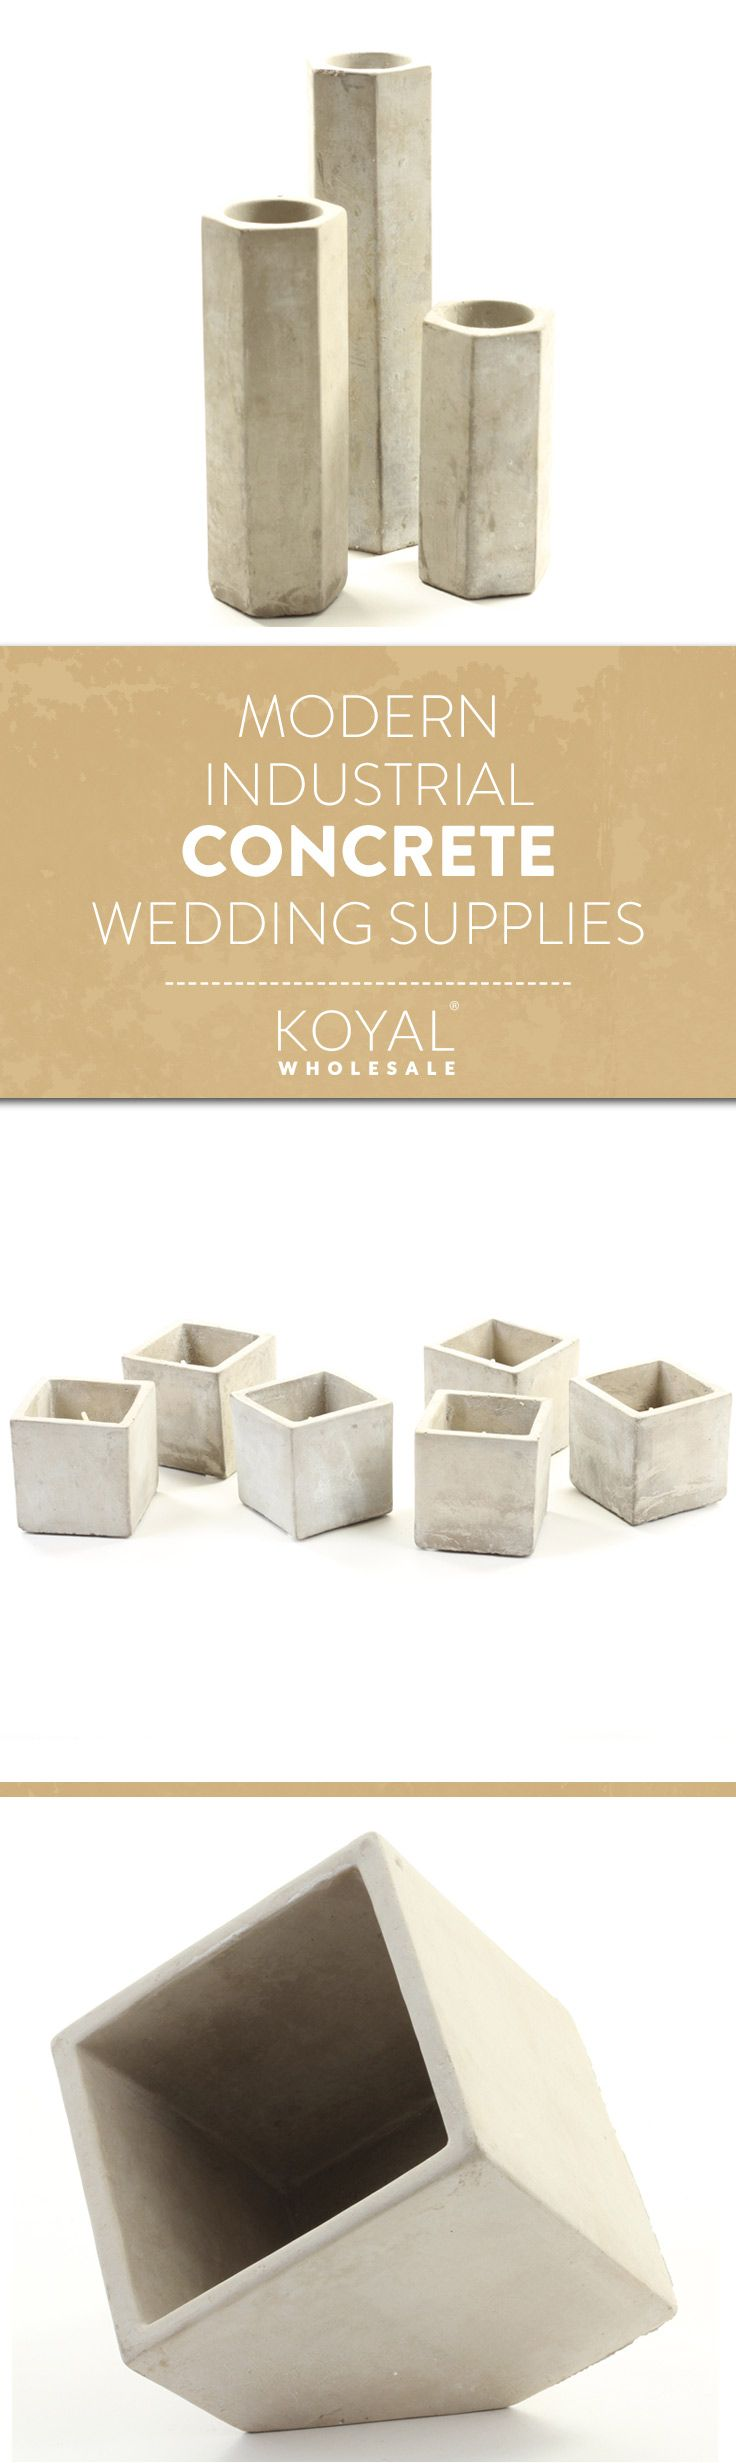 Modern Industrial Concrete Wedding Supplies by KOYAL WHOLESALE ...